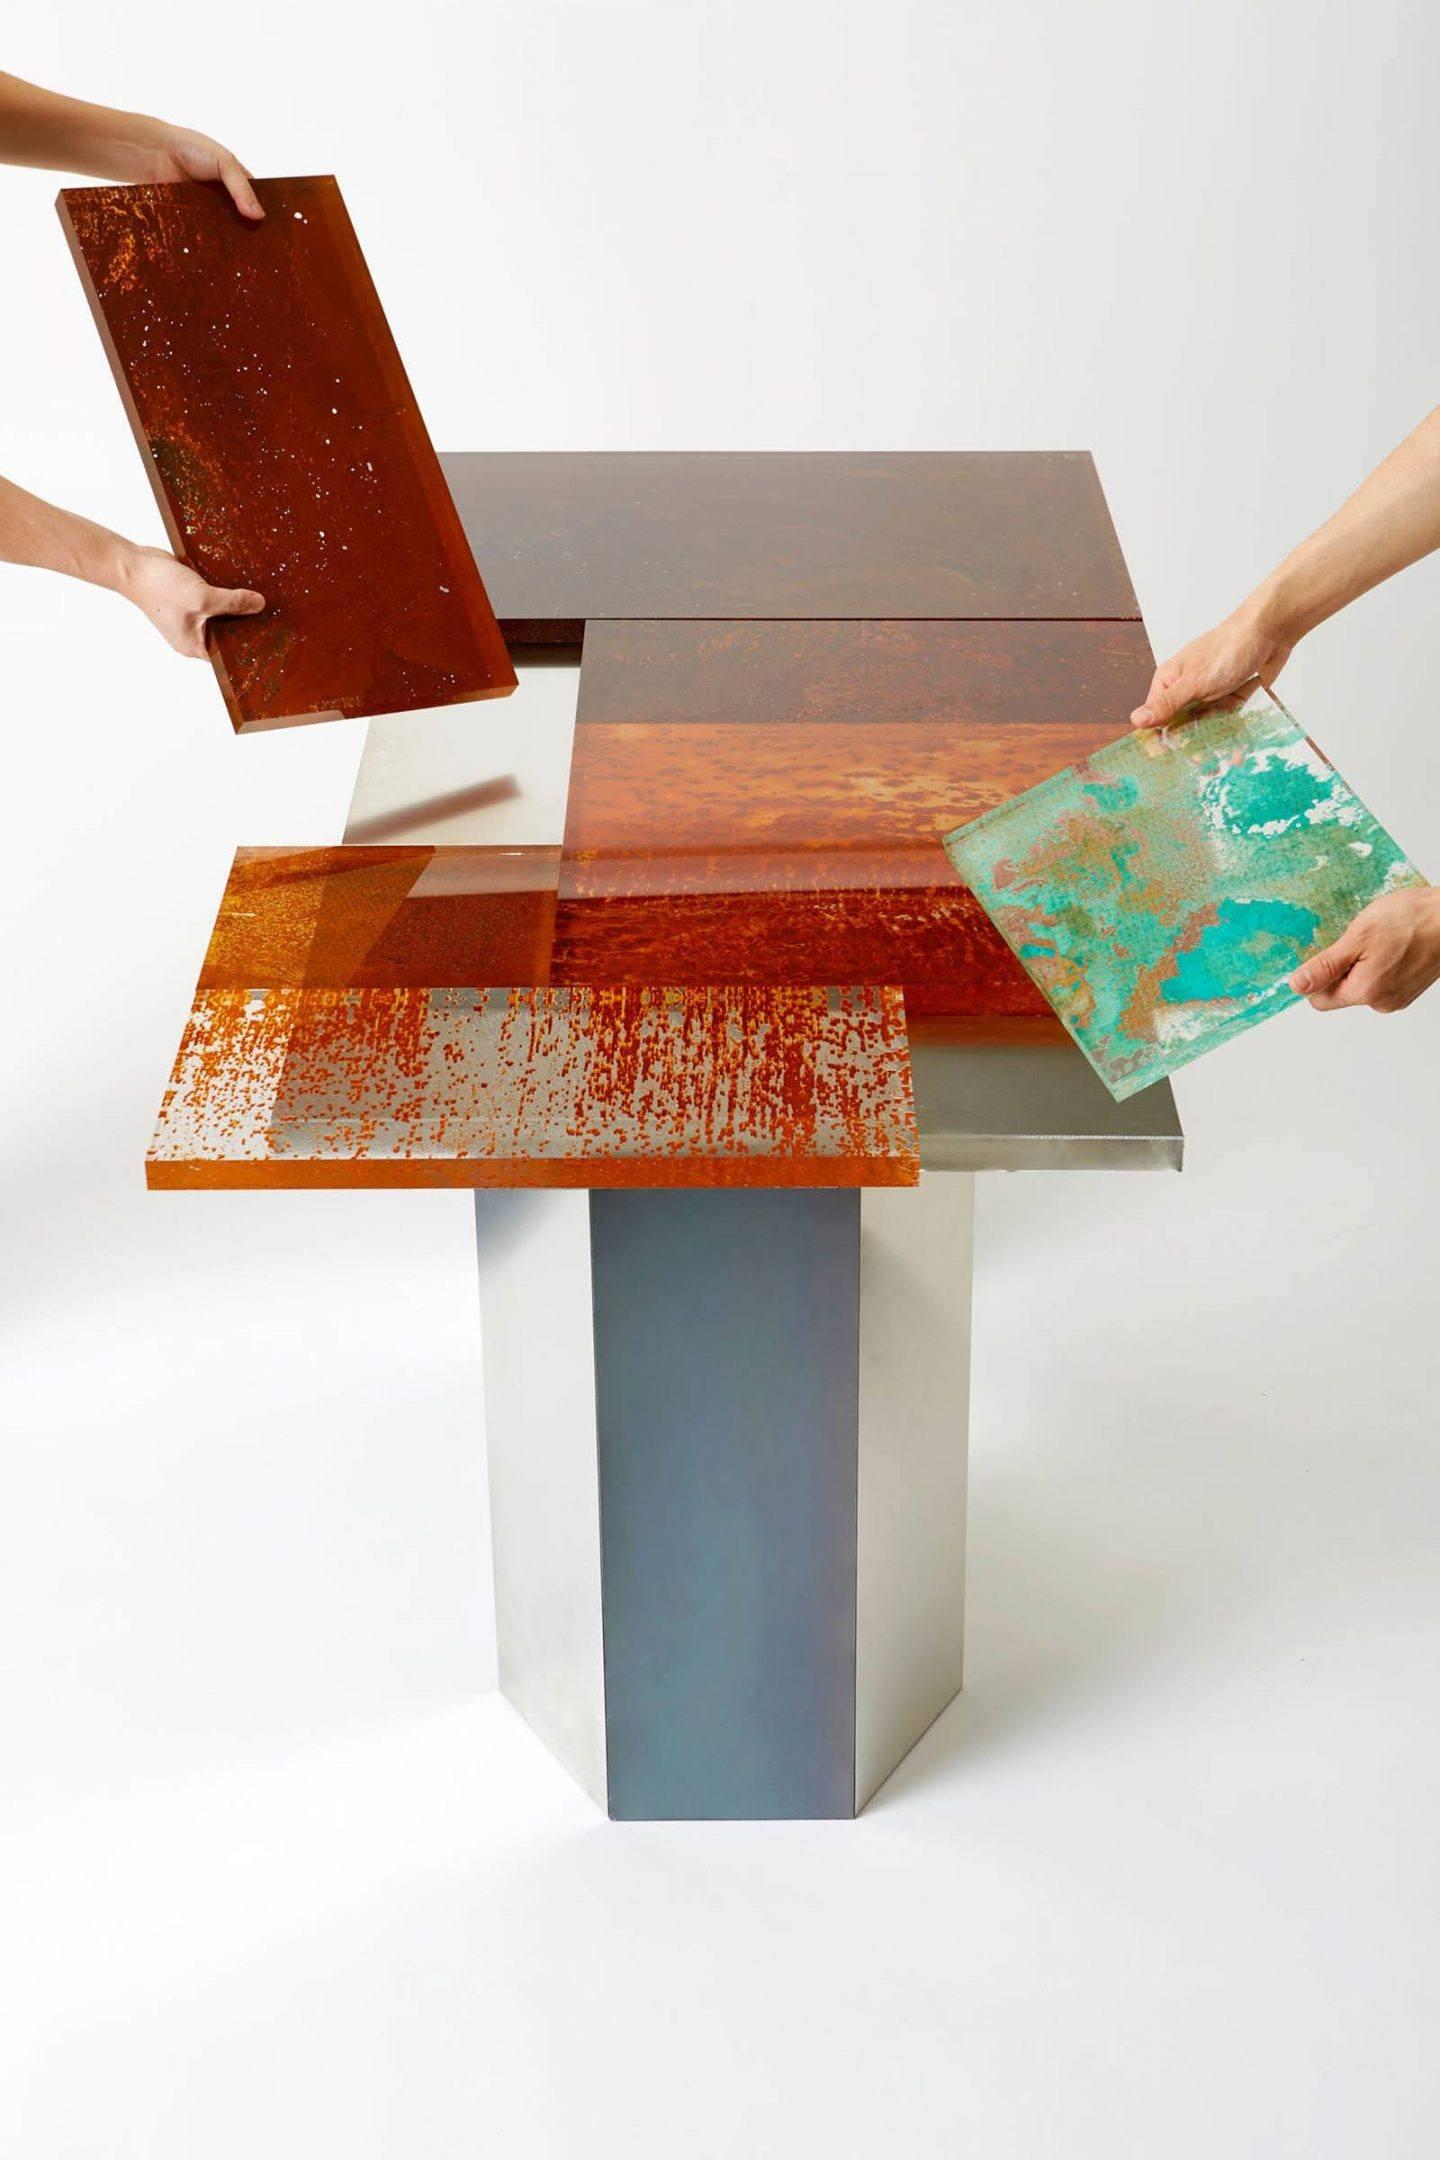 iGNANT-Design-Yuma-Kano-Rust-Harvest-010